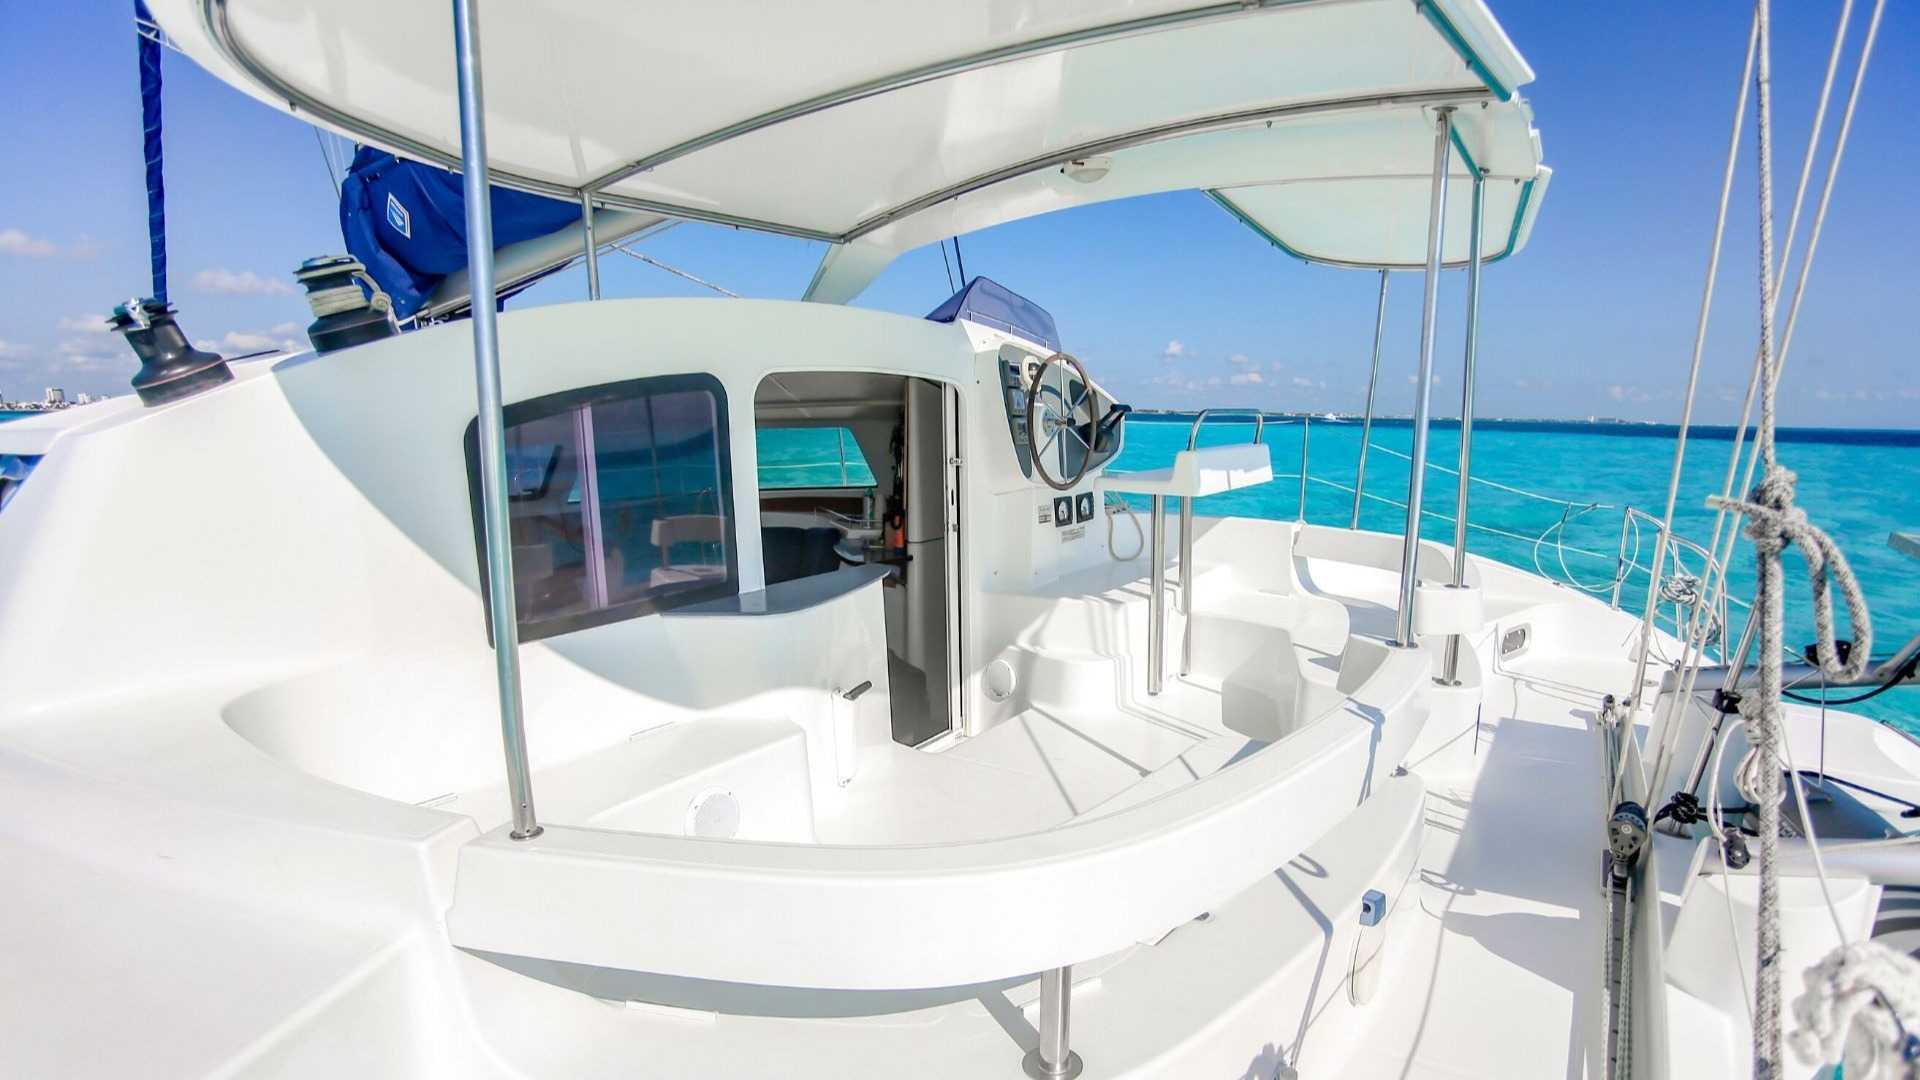 5 - LoRes - Kendo - Isla Mujeres Catamaran Tour - Cancun Sailing